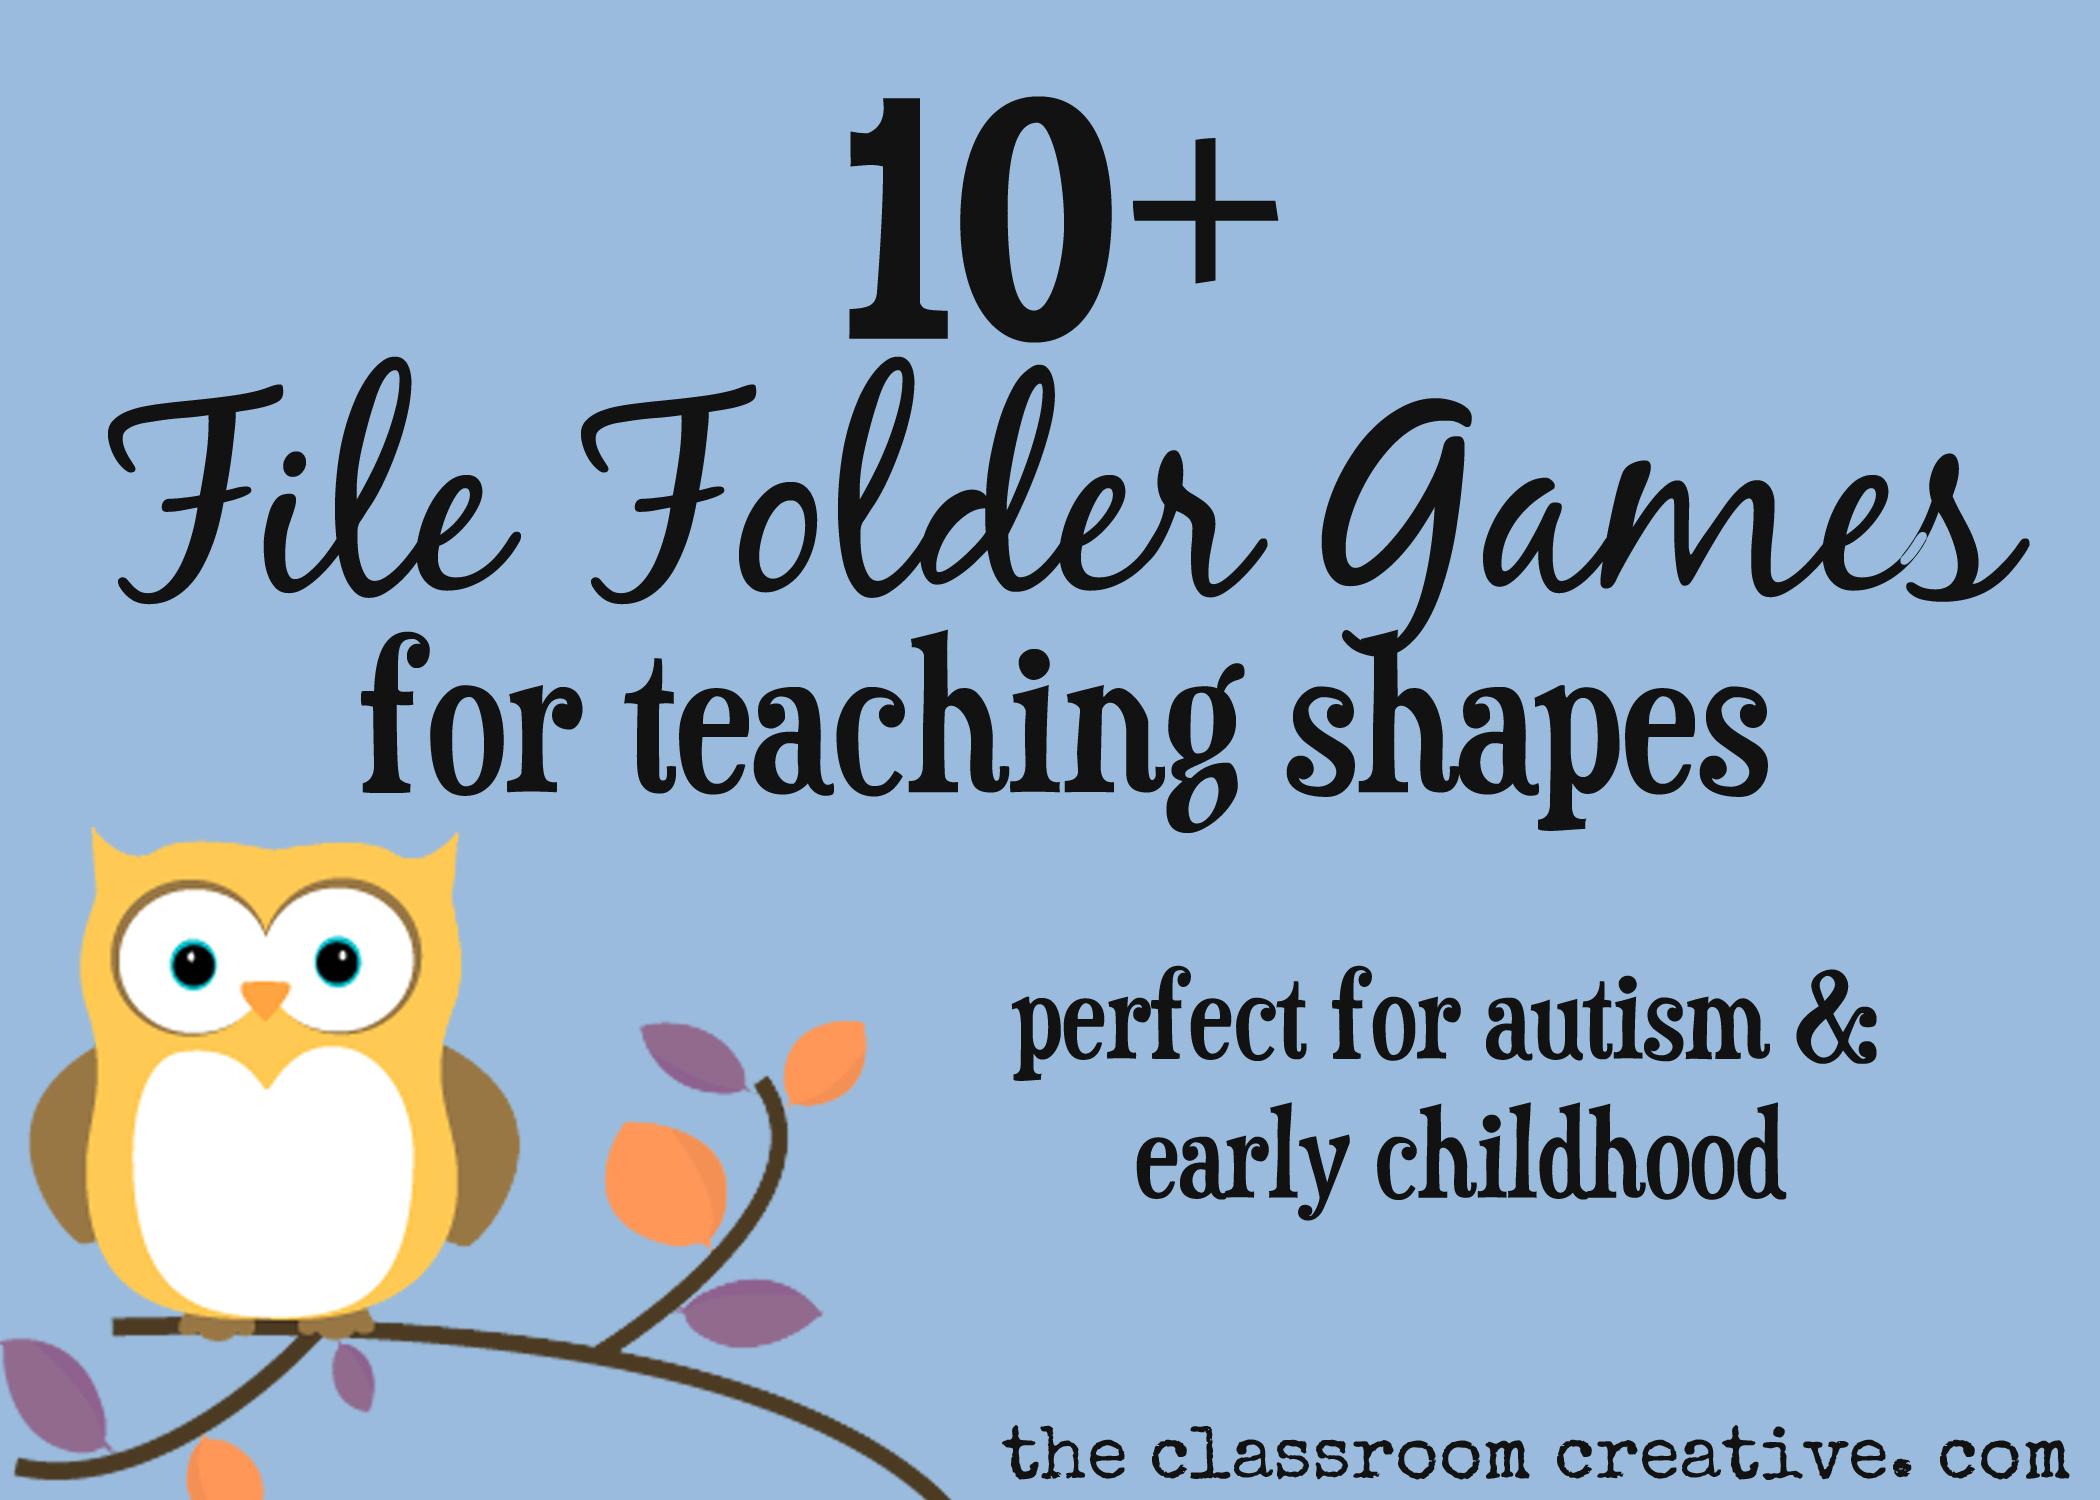 File Folder Games For Teaching Shapes - Free Printable Preschool Folder Games